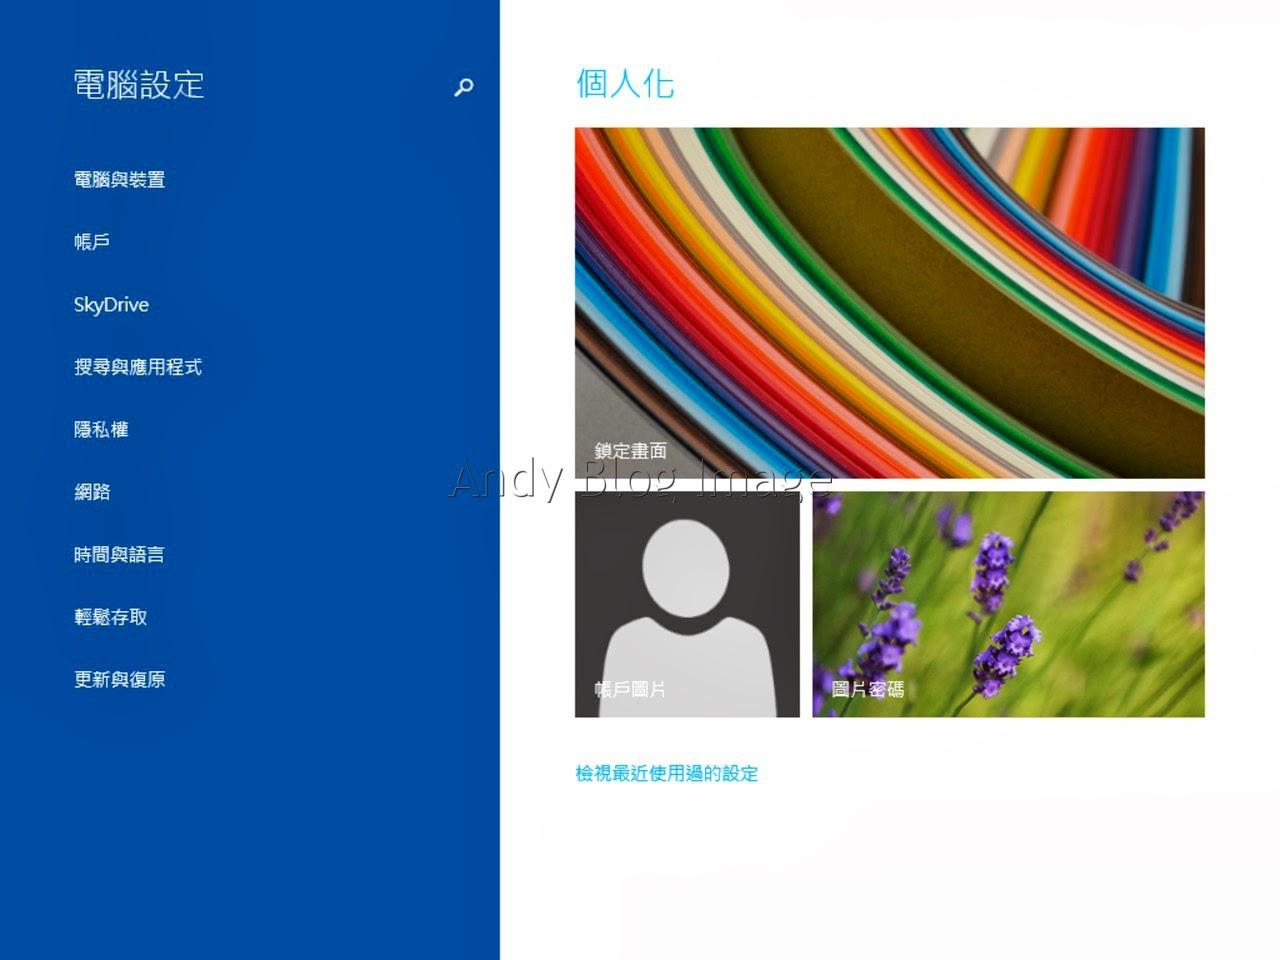 Andy 的隨手寫技術筆記本: Windows 8.1 RTM 釋出